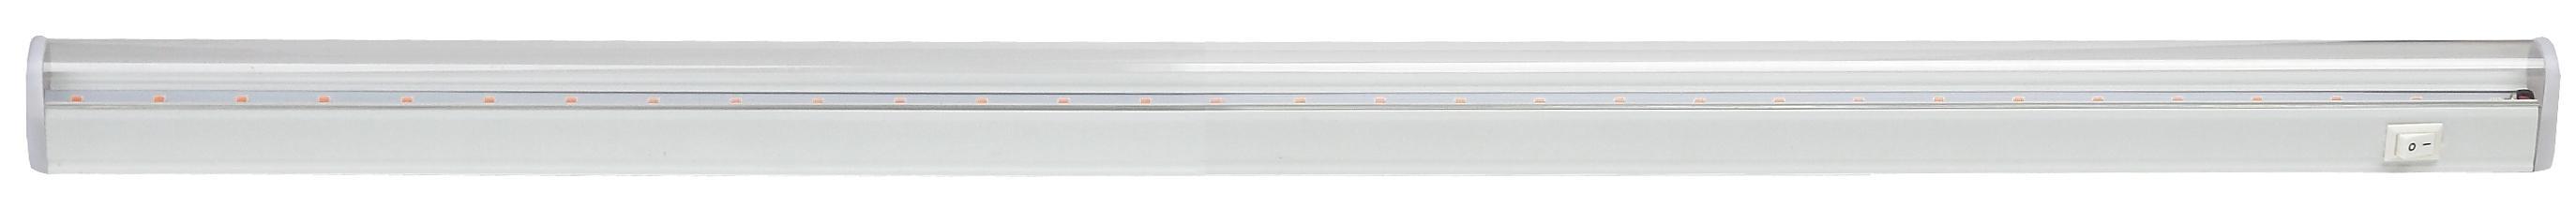 Светильник ЭРА Lled-05-t5-fito-9w-w датчик движения эра md 03